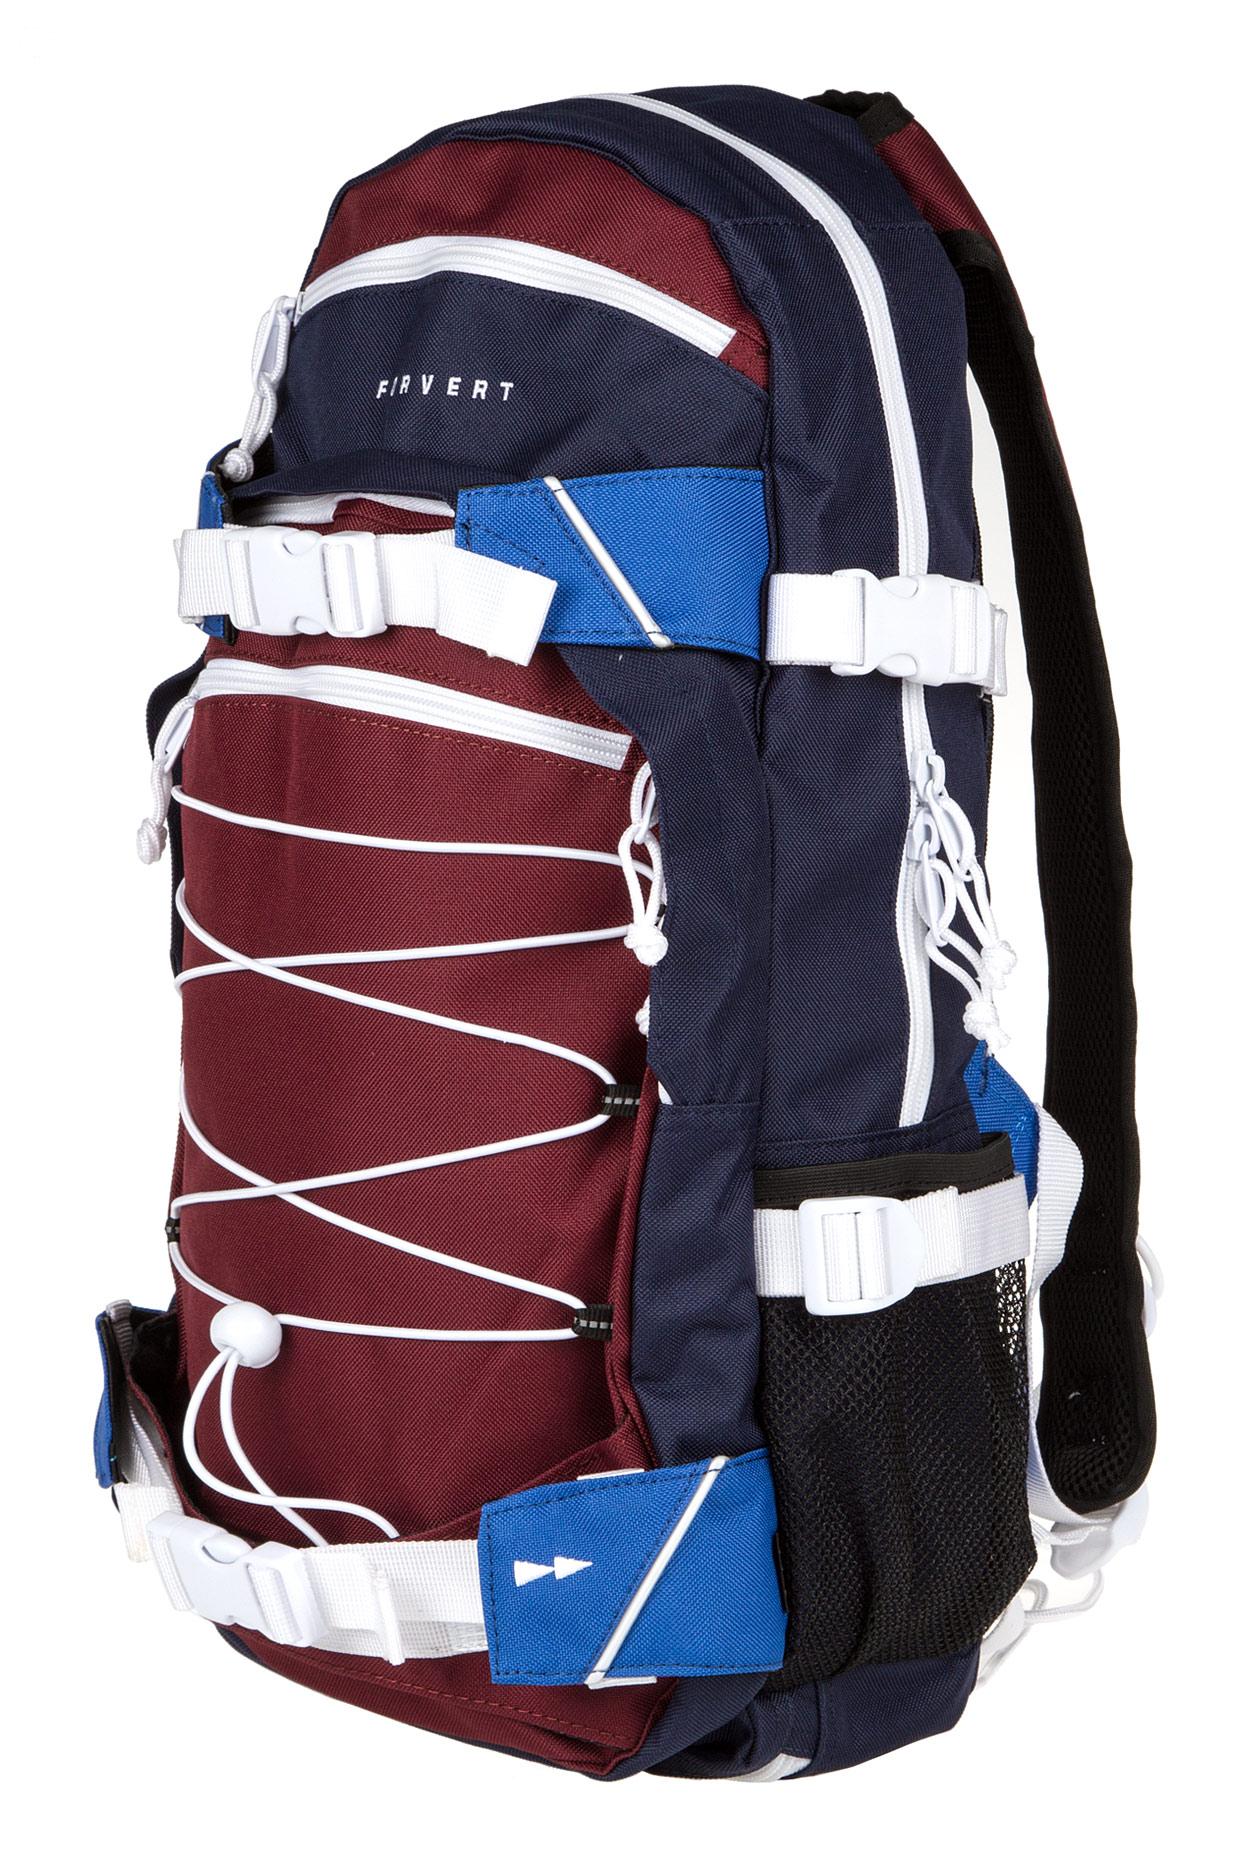 forvert ice louis backpack 20l multicolour iv buy at skatedeluxe. Black Bedroom Furniture Sets. Home Design Ideas